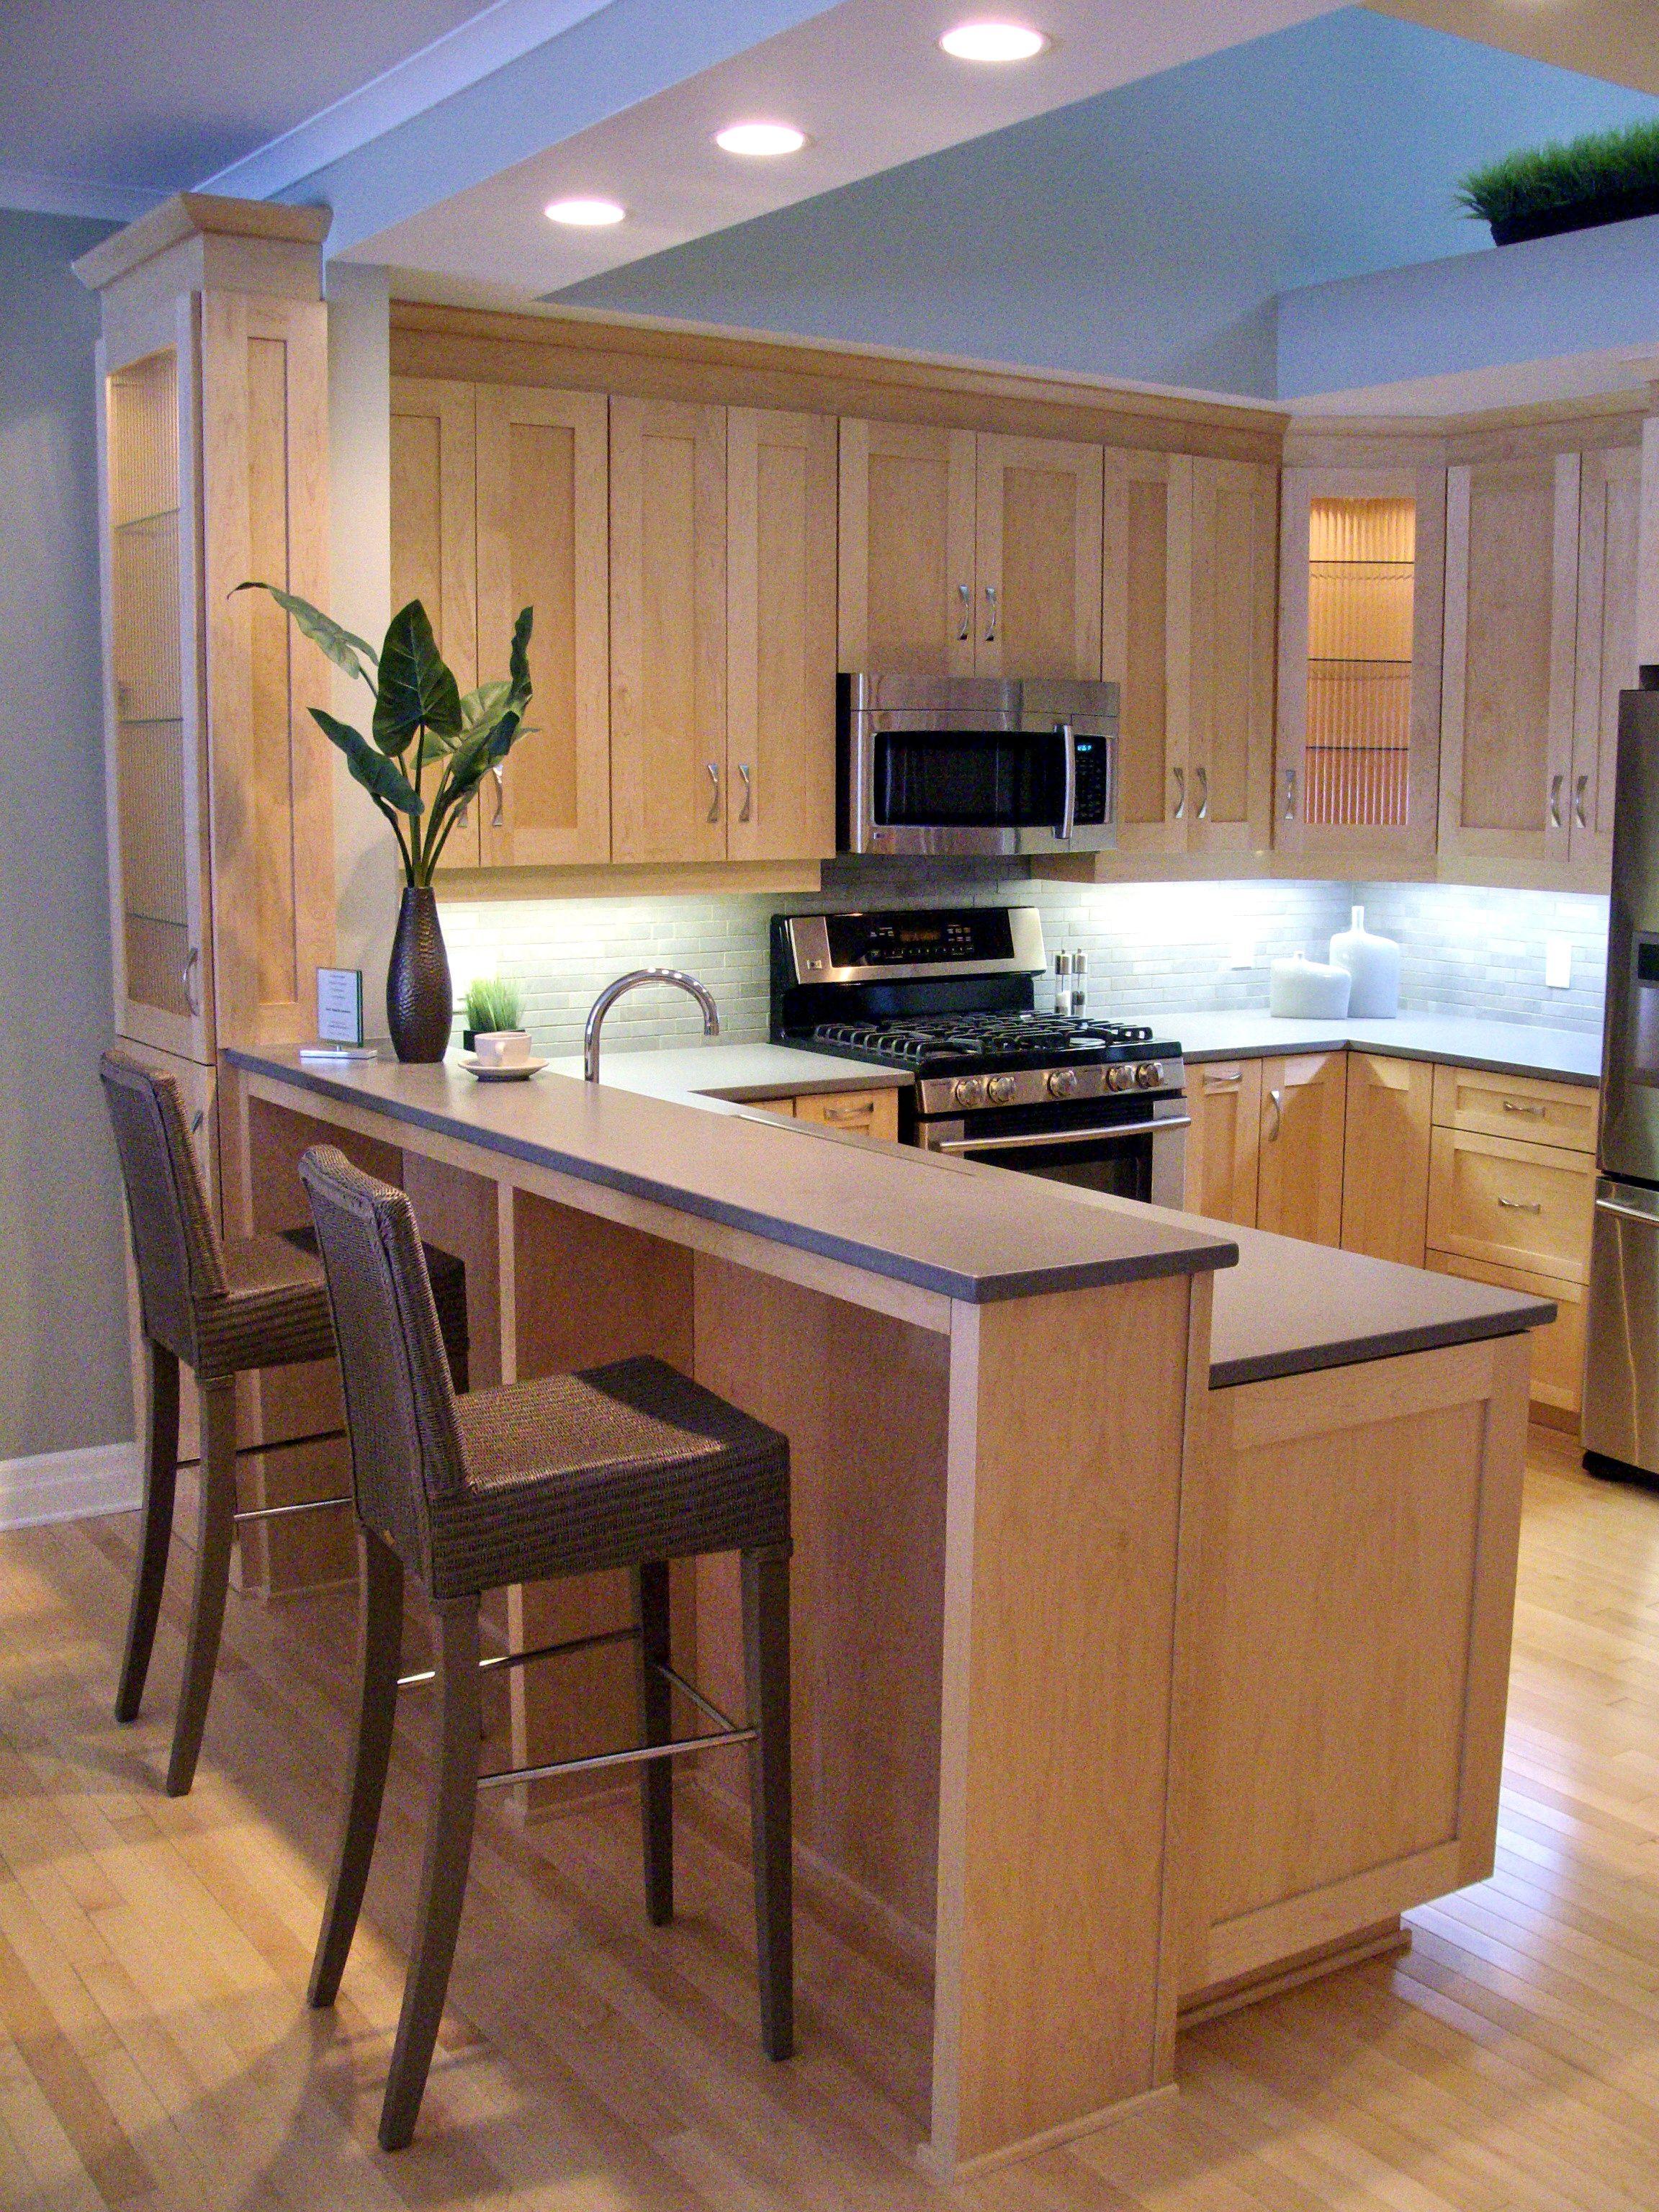 Natural Maple Shaker Cabinets With Grey Silestone Quartz Countertops Maple Kitchen Cabinets Kitchen Renovation Kitchen Design